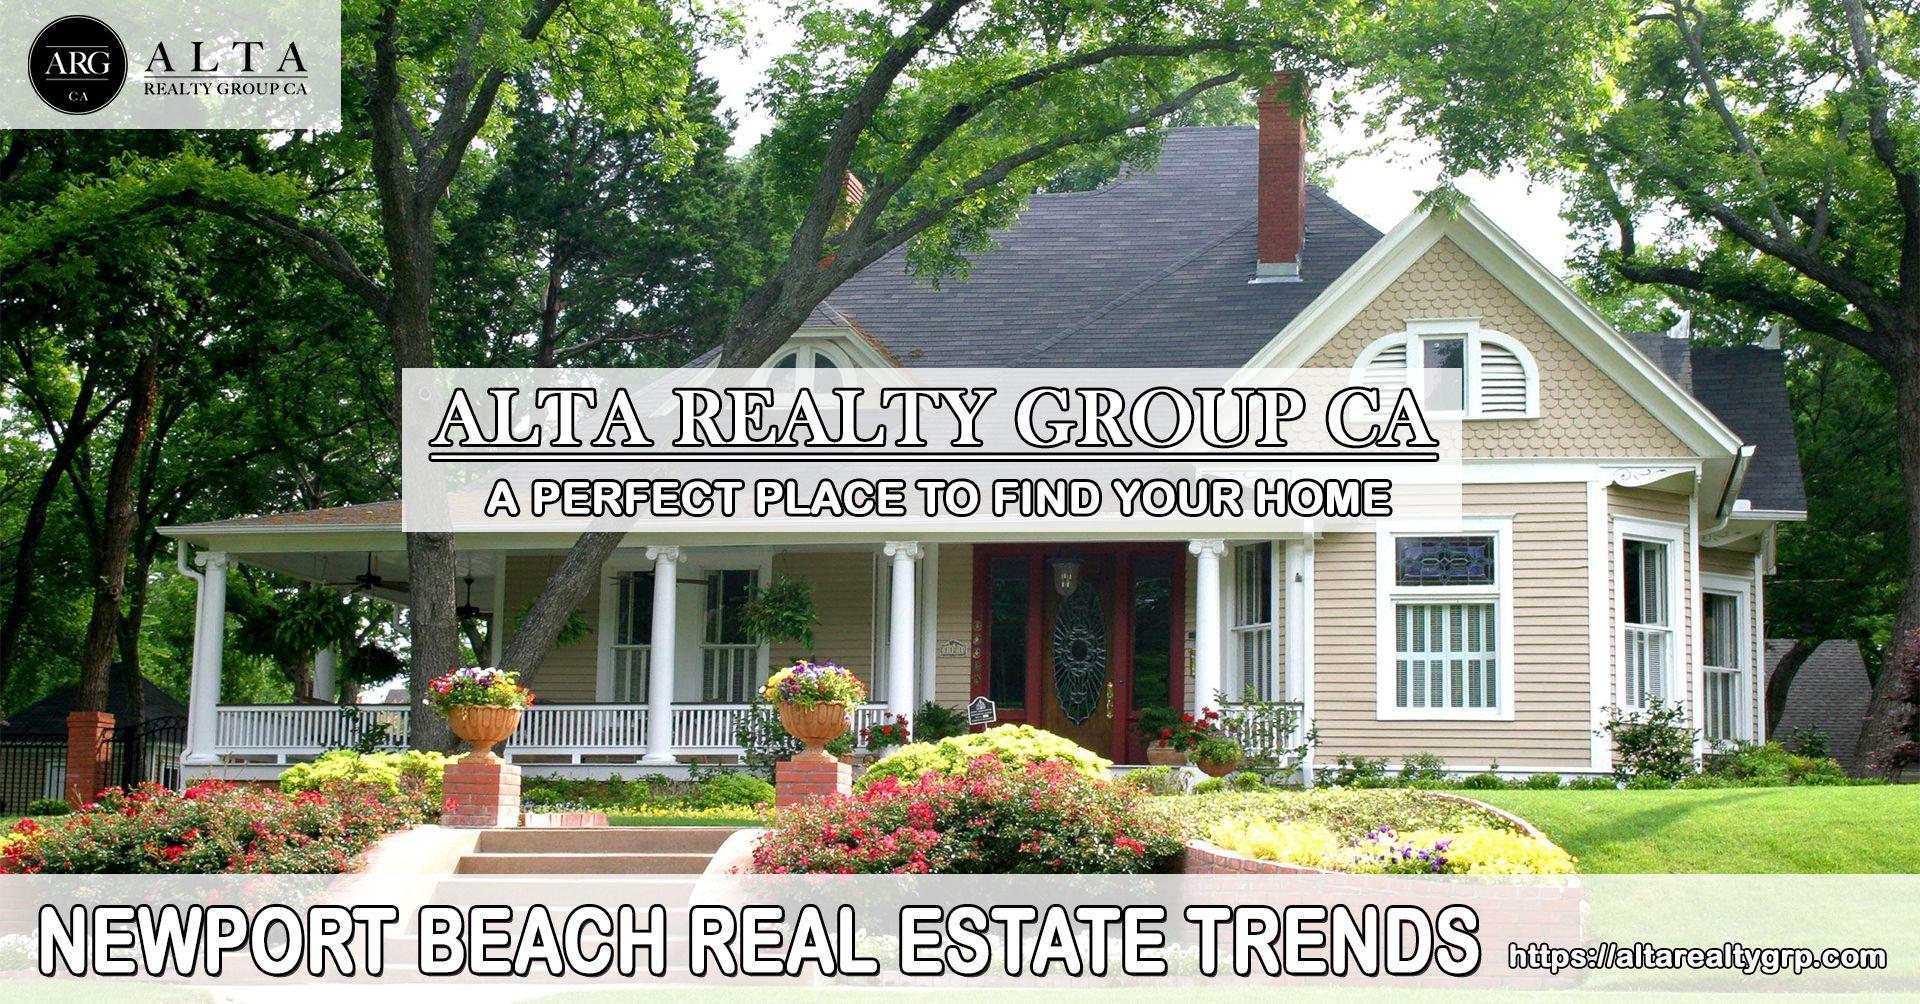 Newport Beach Real Estate Jobs Real Estate Real Estate Trends Real Estate Jobs